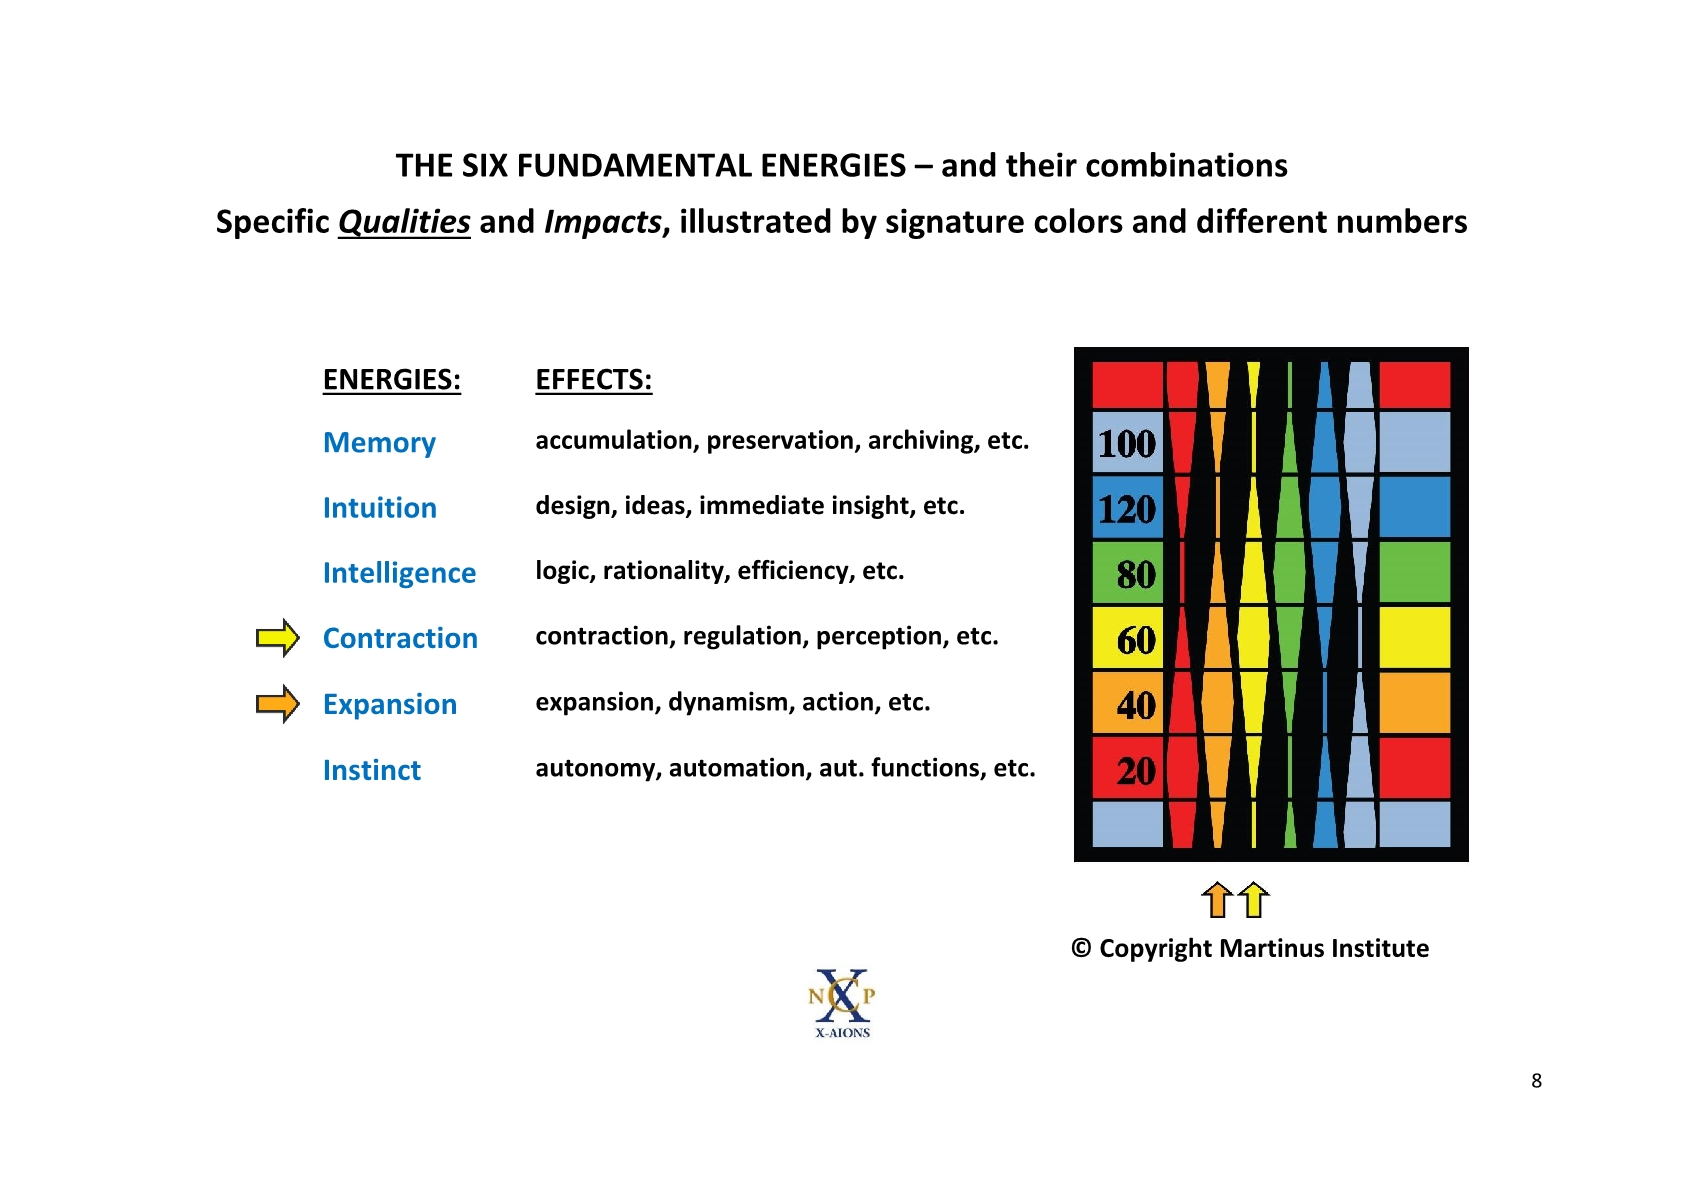 TSC 2012 The Qualitative Fundamental Energies NCP X-AIONS